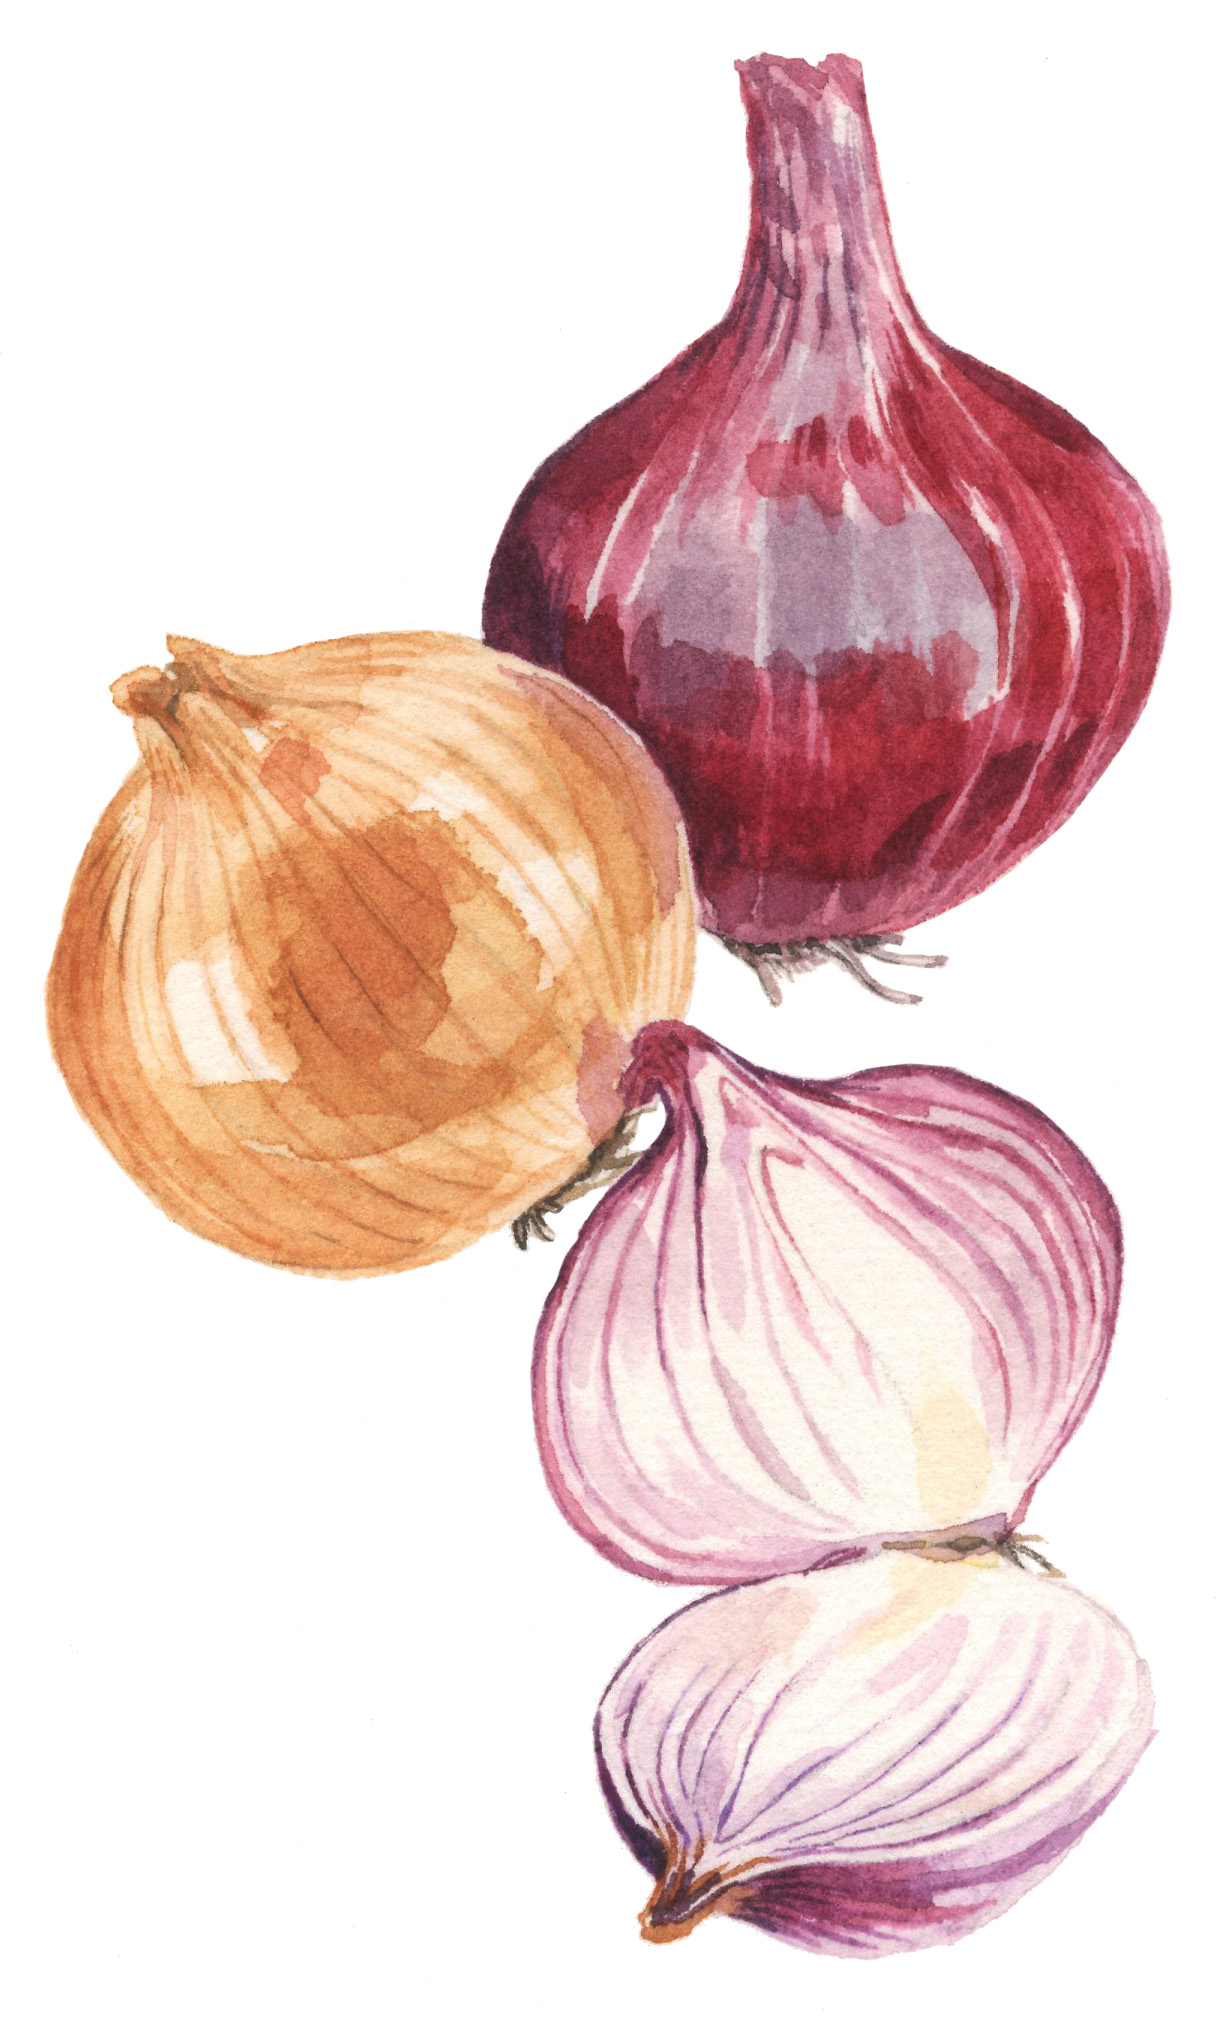 onions-lrg.jpg